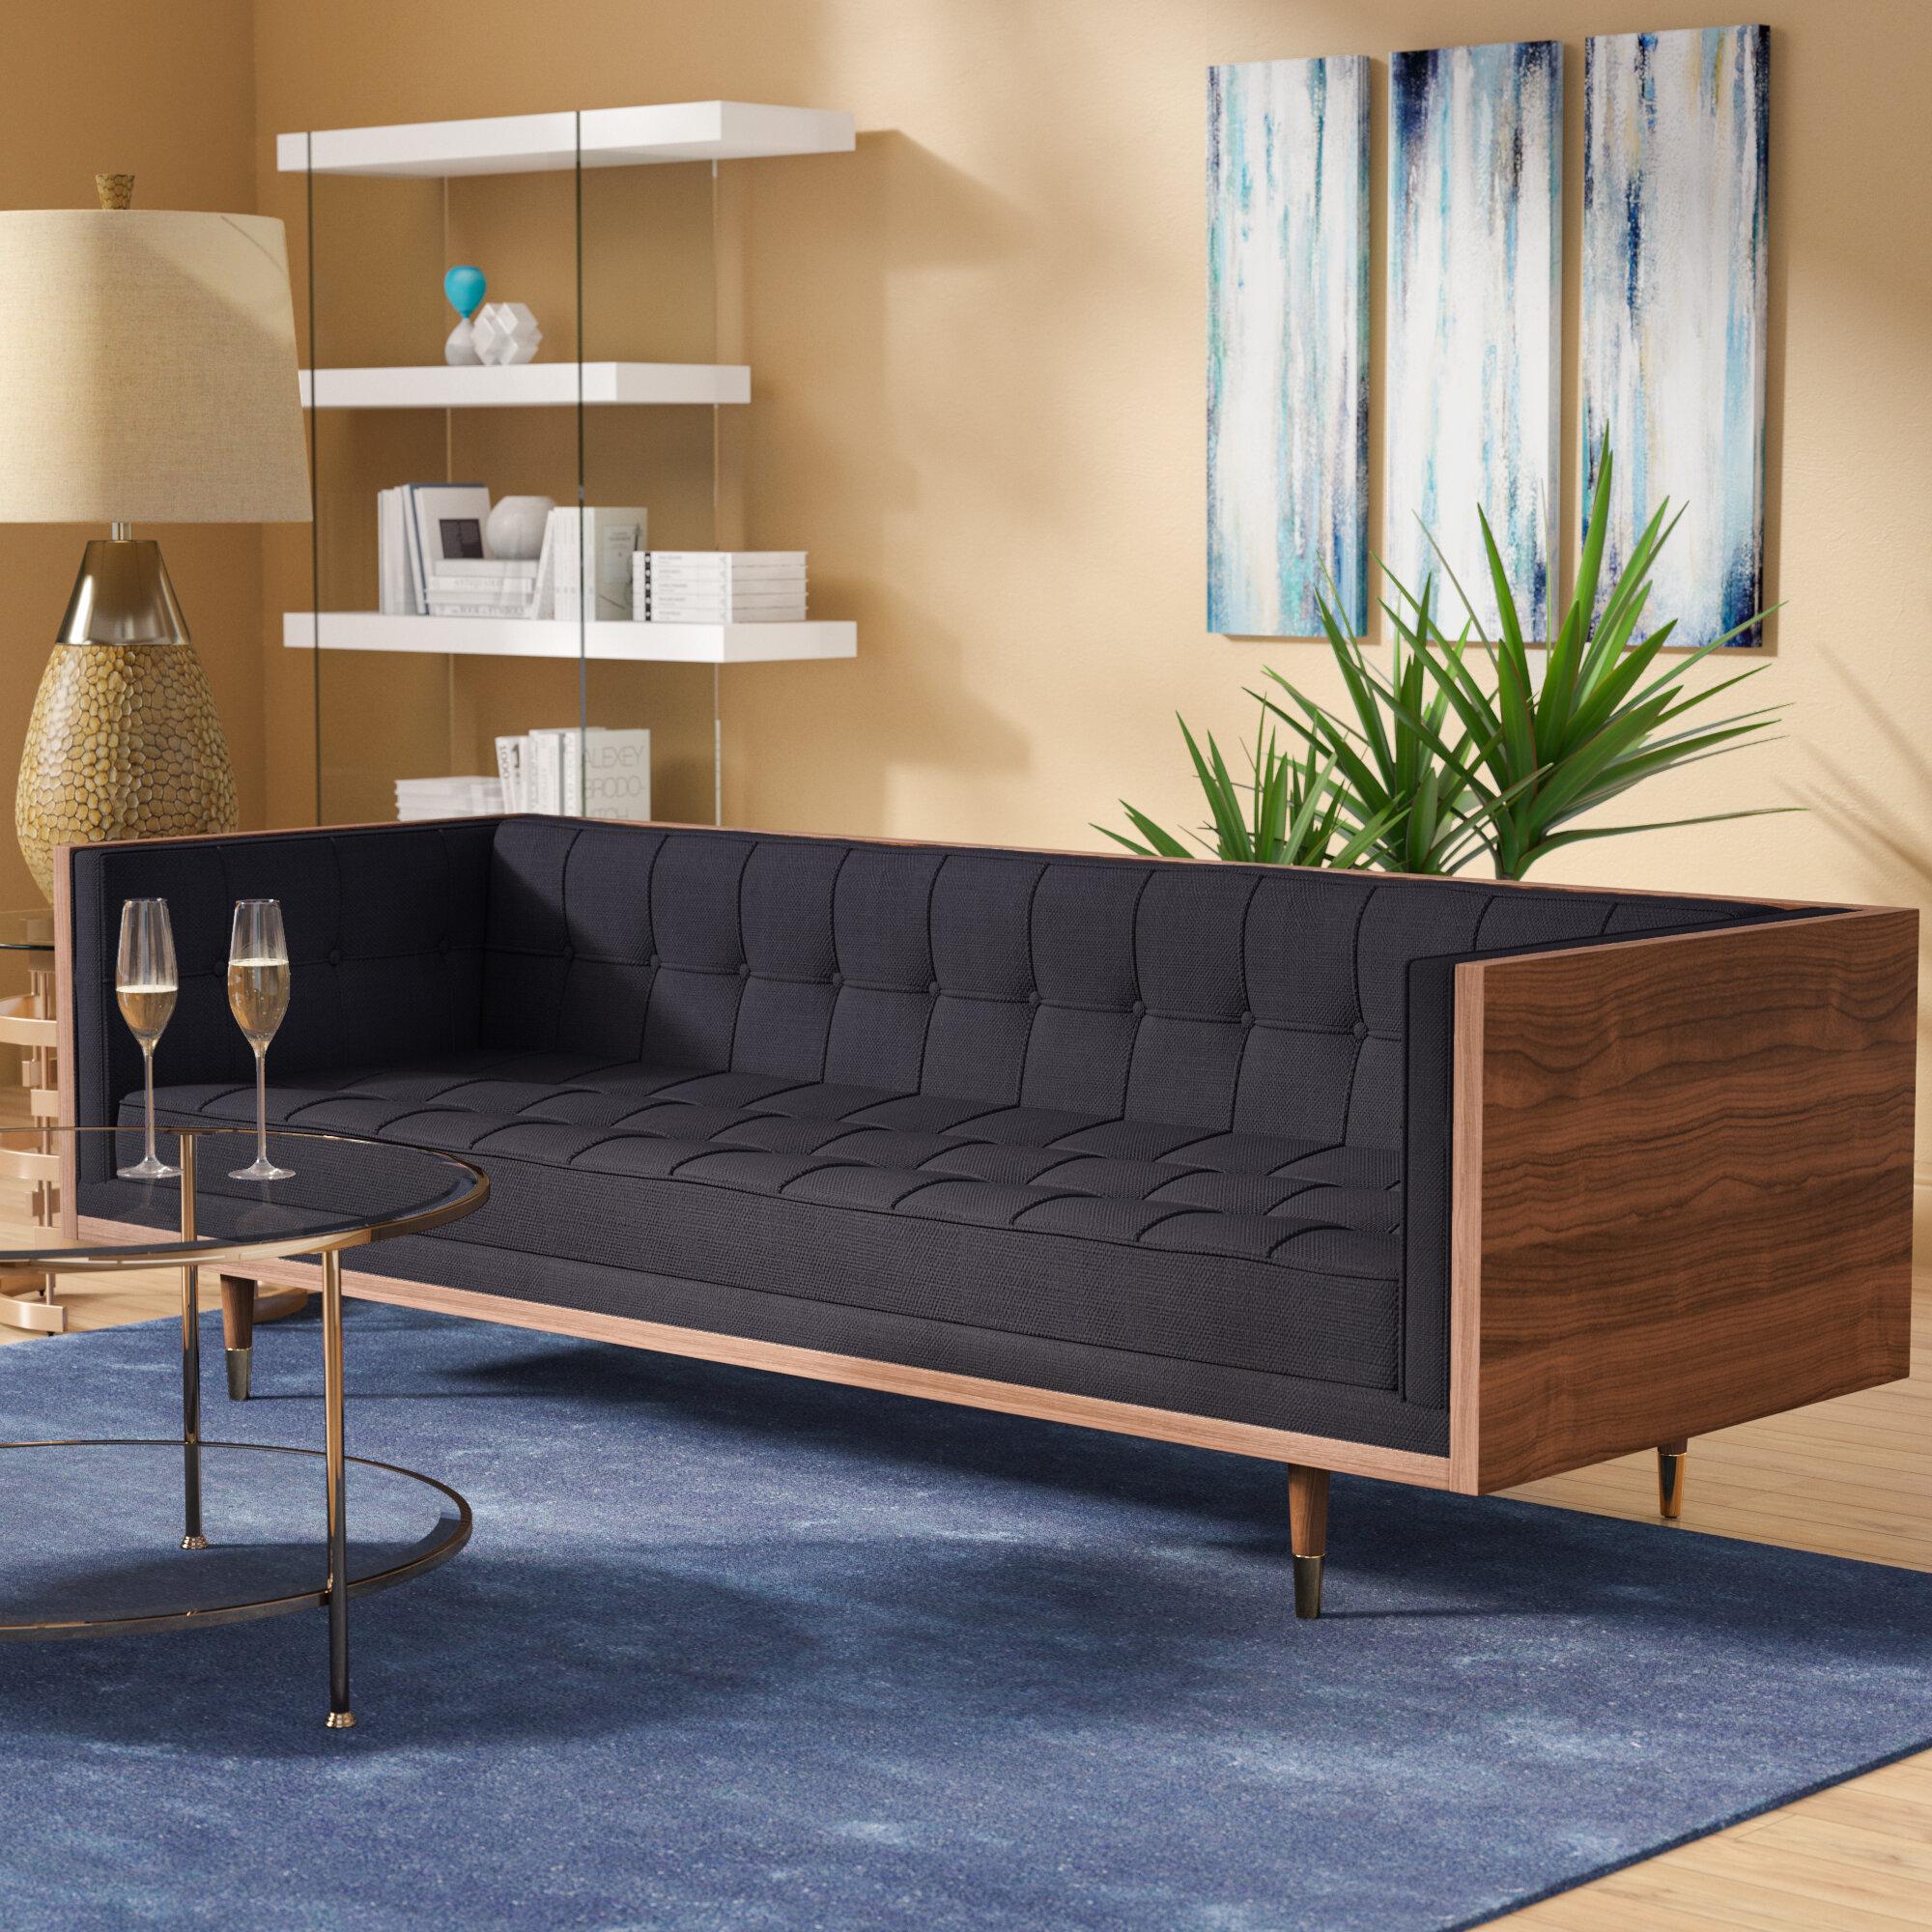 Comm office lancaster chesterfield sofa reviews wayfair